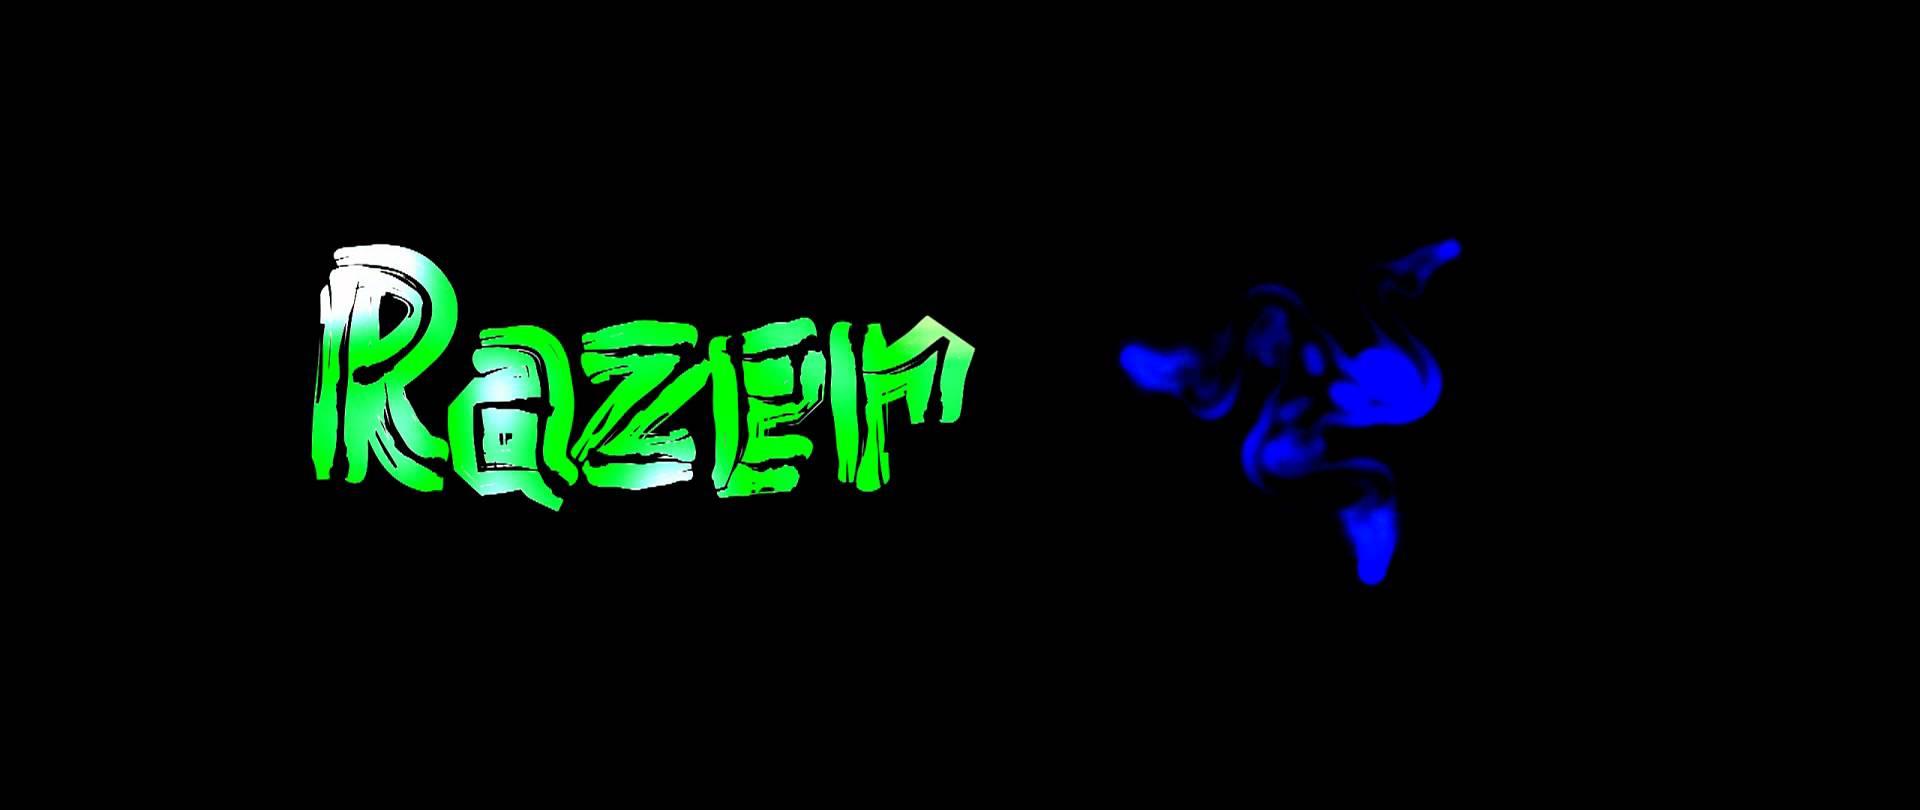 Razer Chroma Animated Wallpaper 28 Images Wallpaper Engine Razer